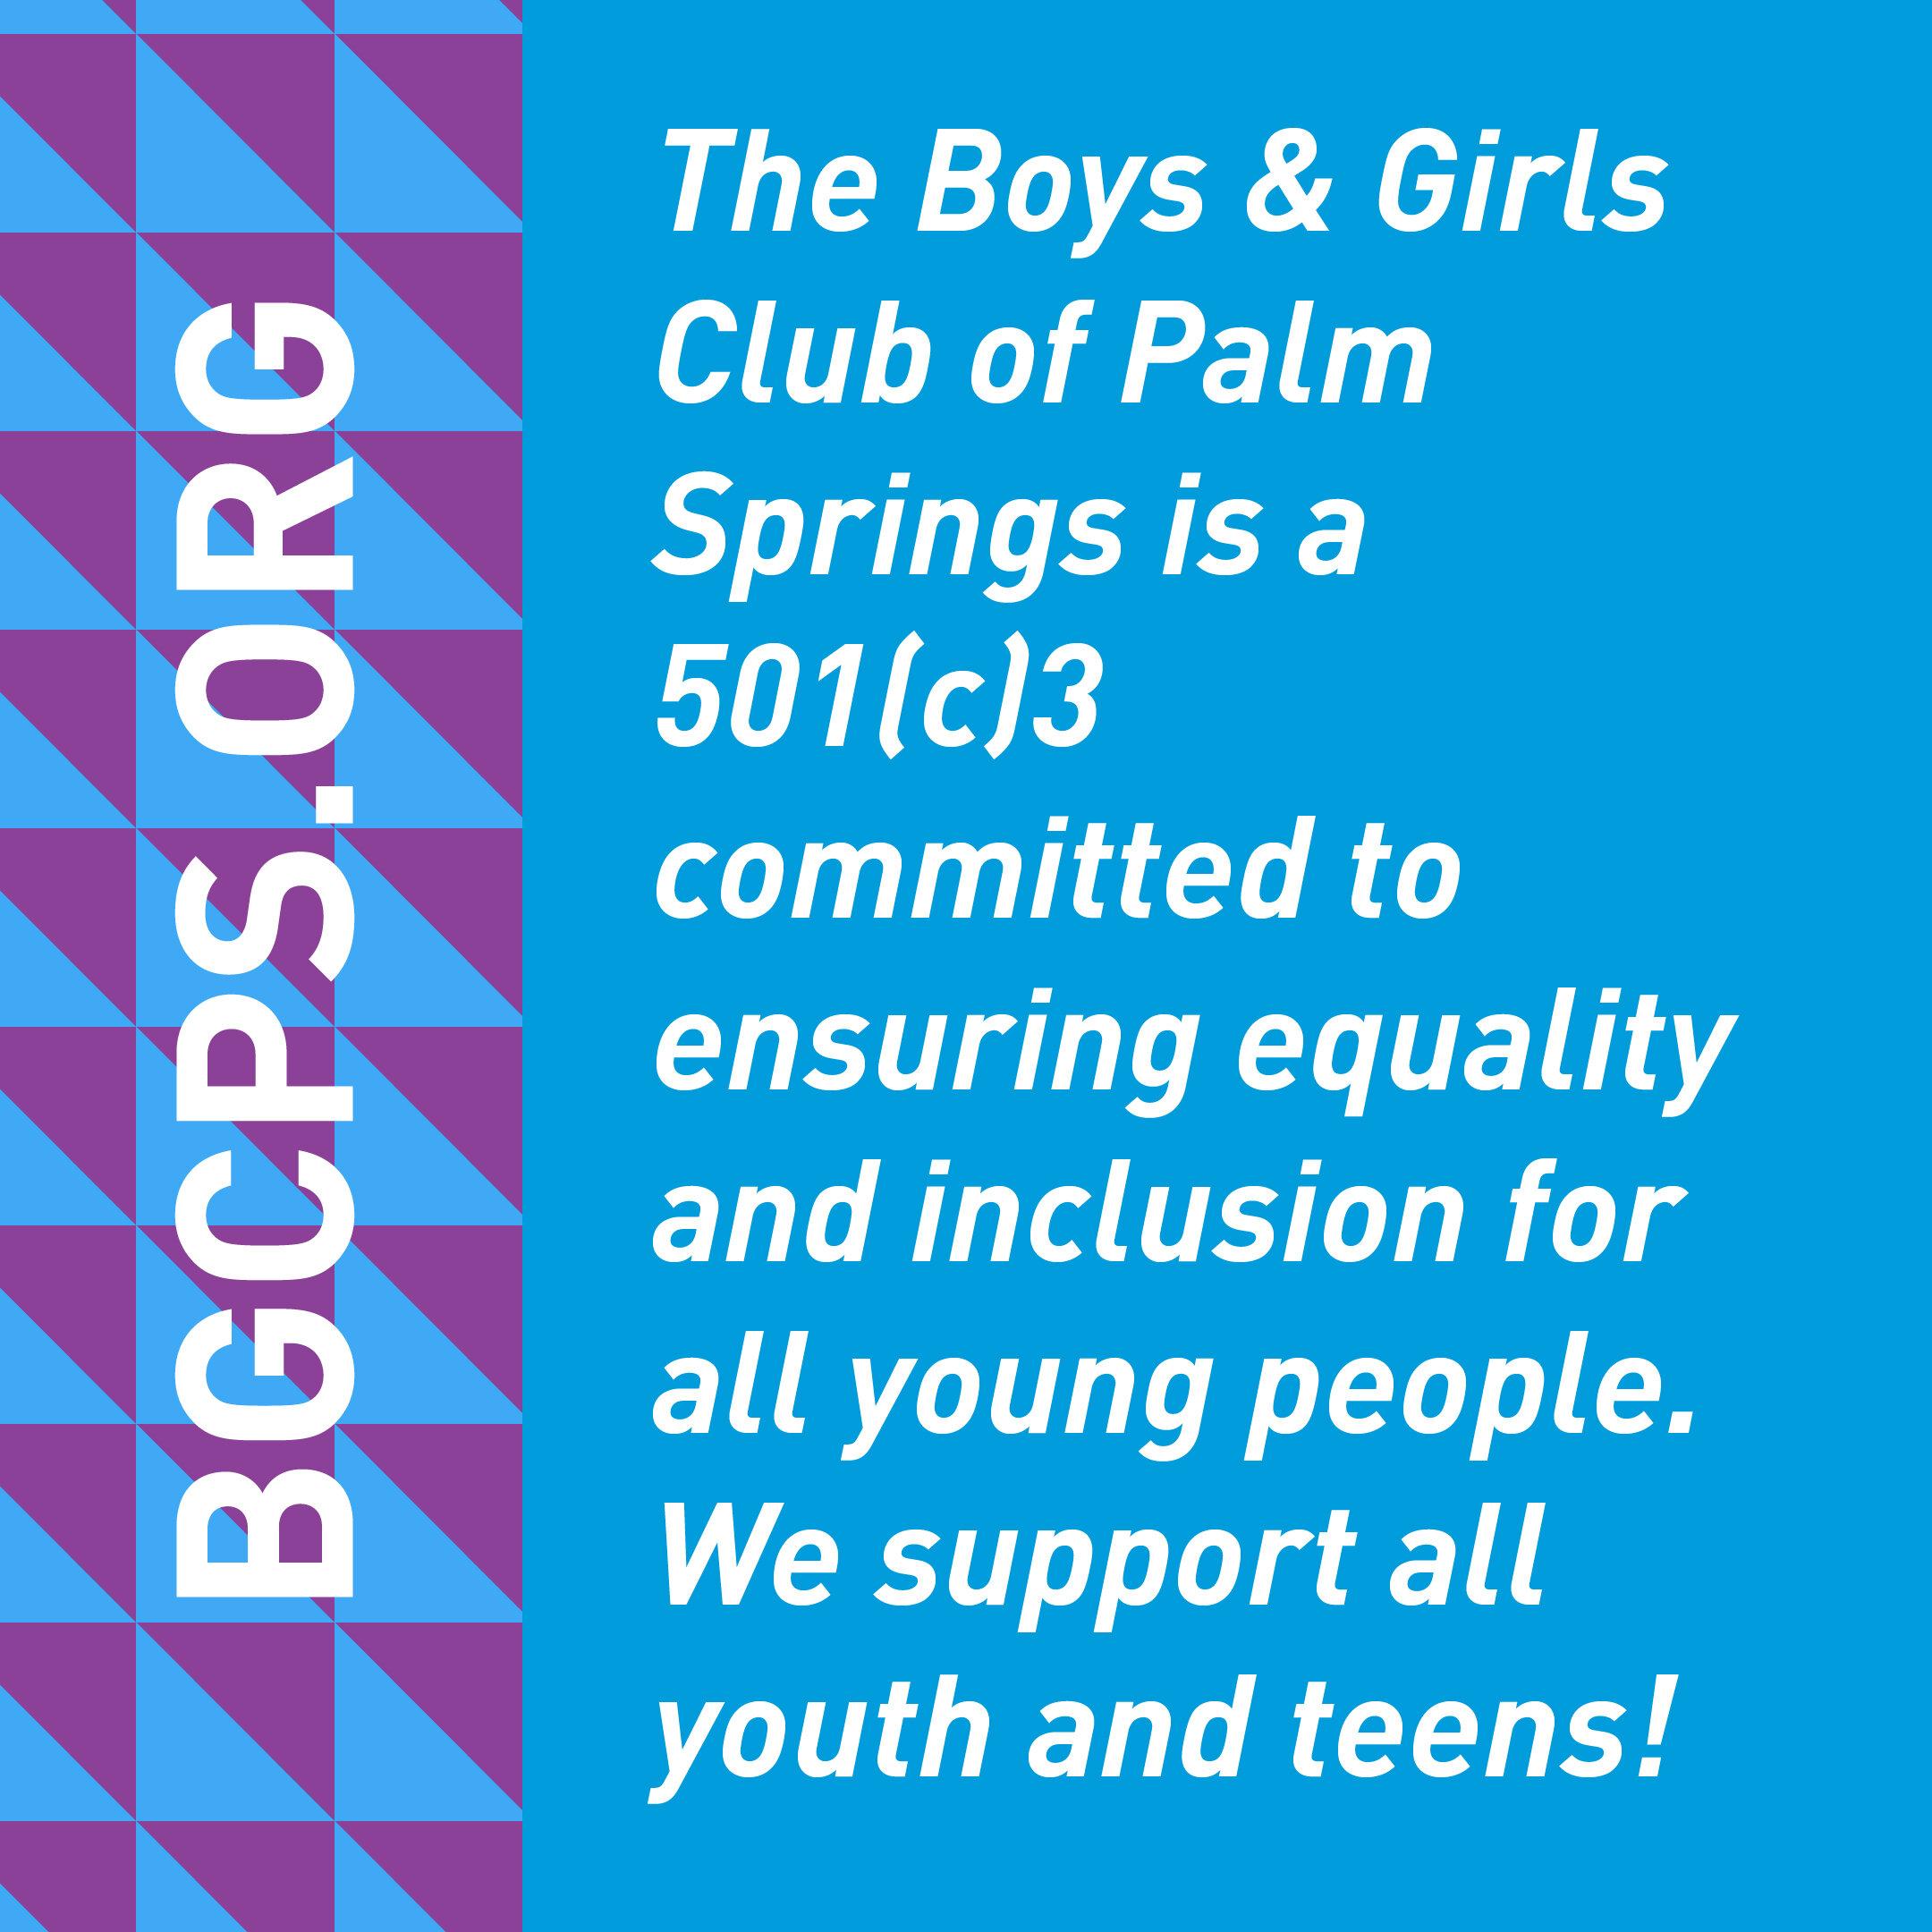 BGCPSArtboard 1 copy 20BGCPS Equality.jpg